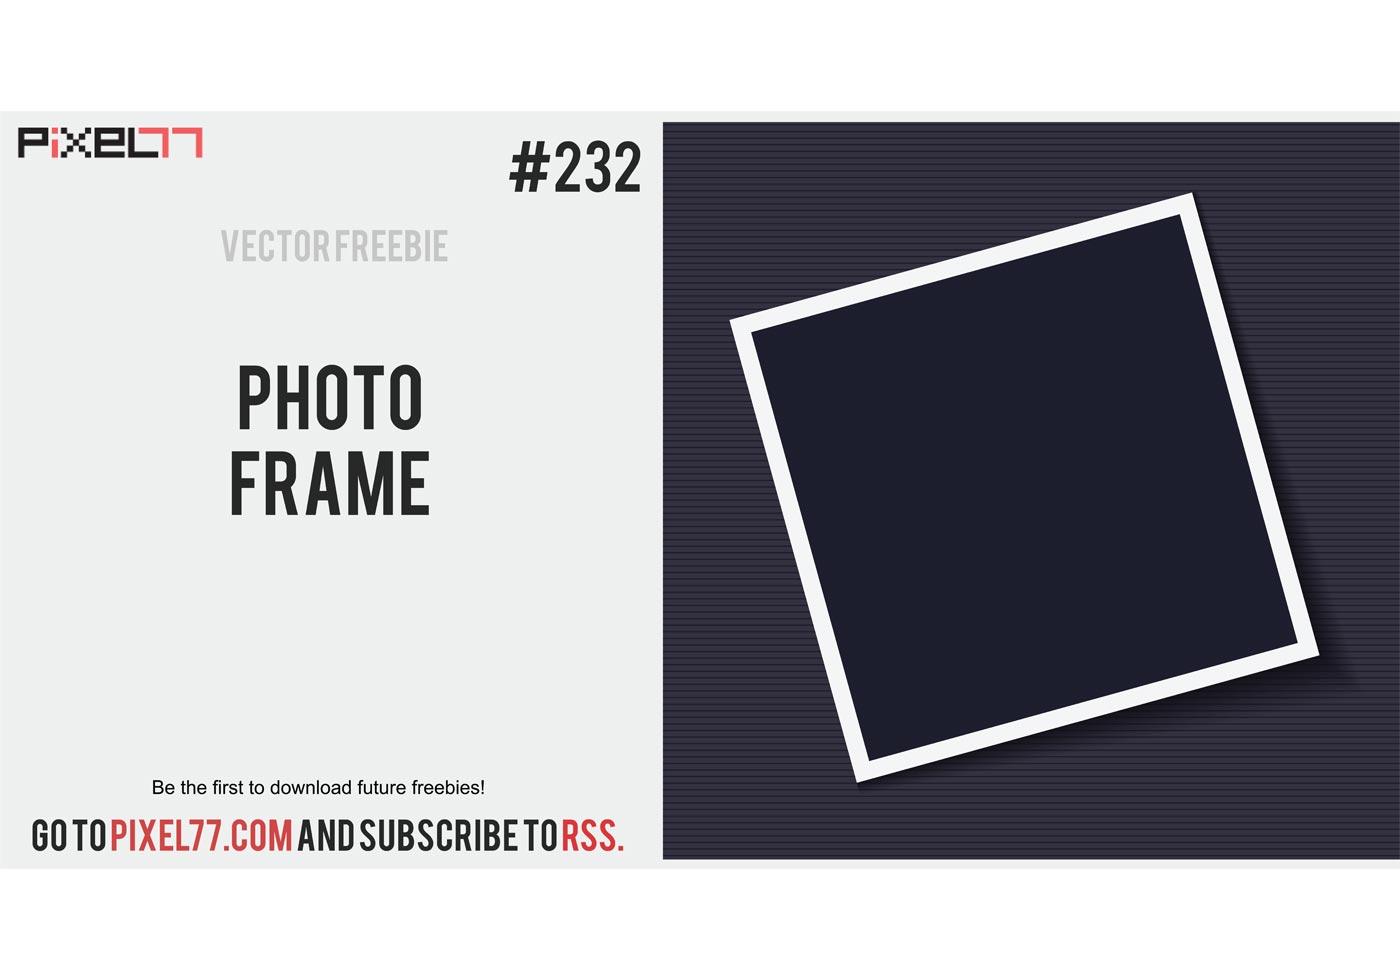 Photo Frame Vector Free Vector Art At Vecteezy